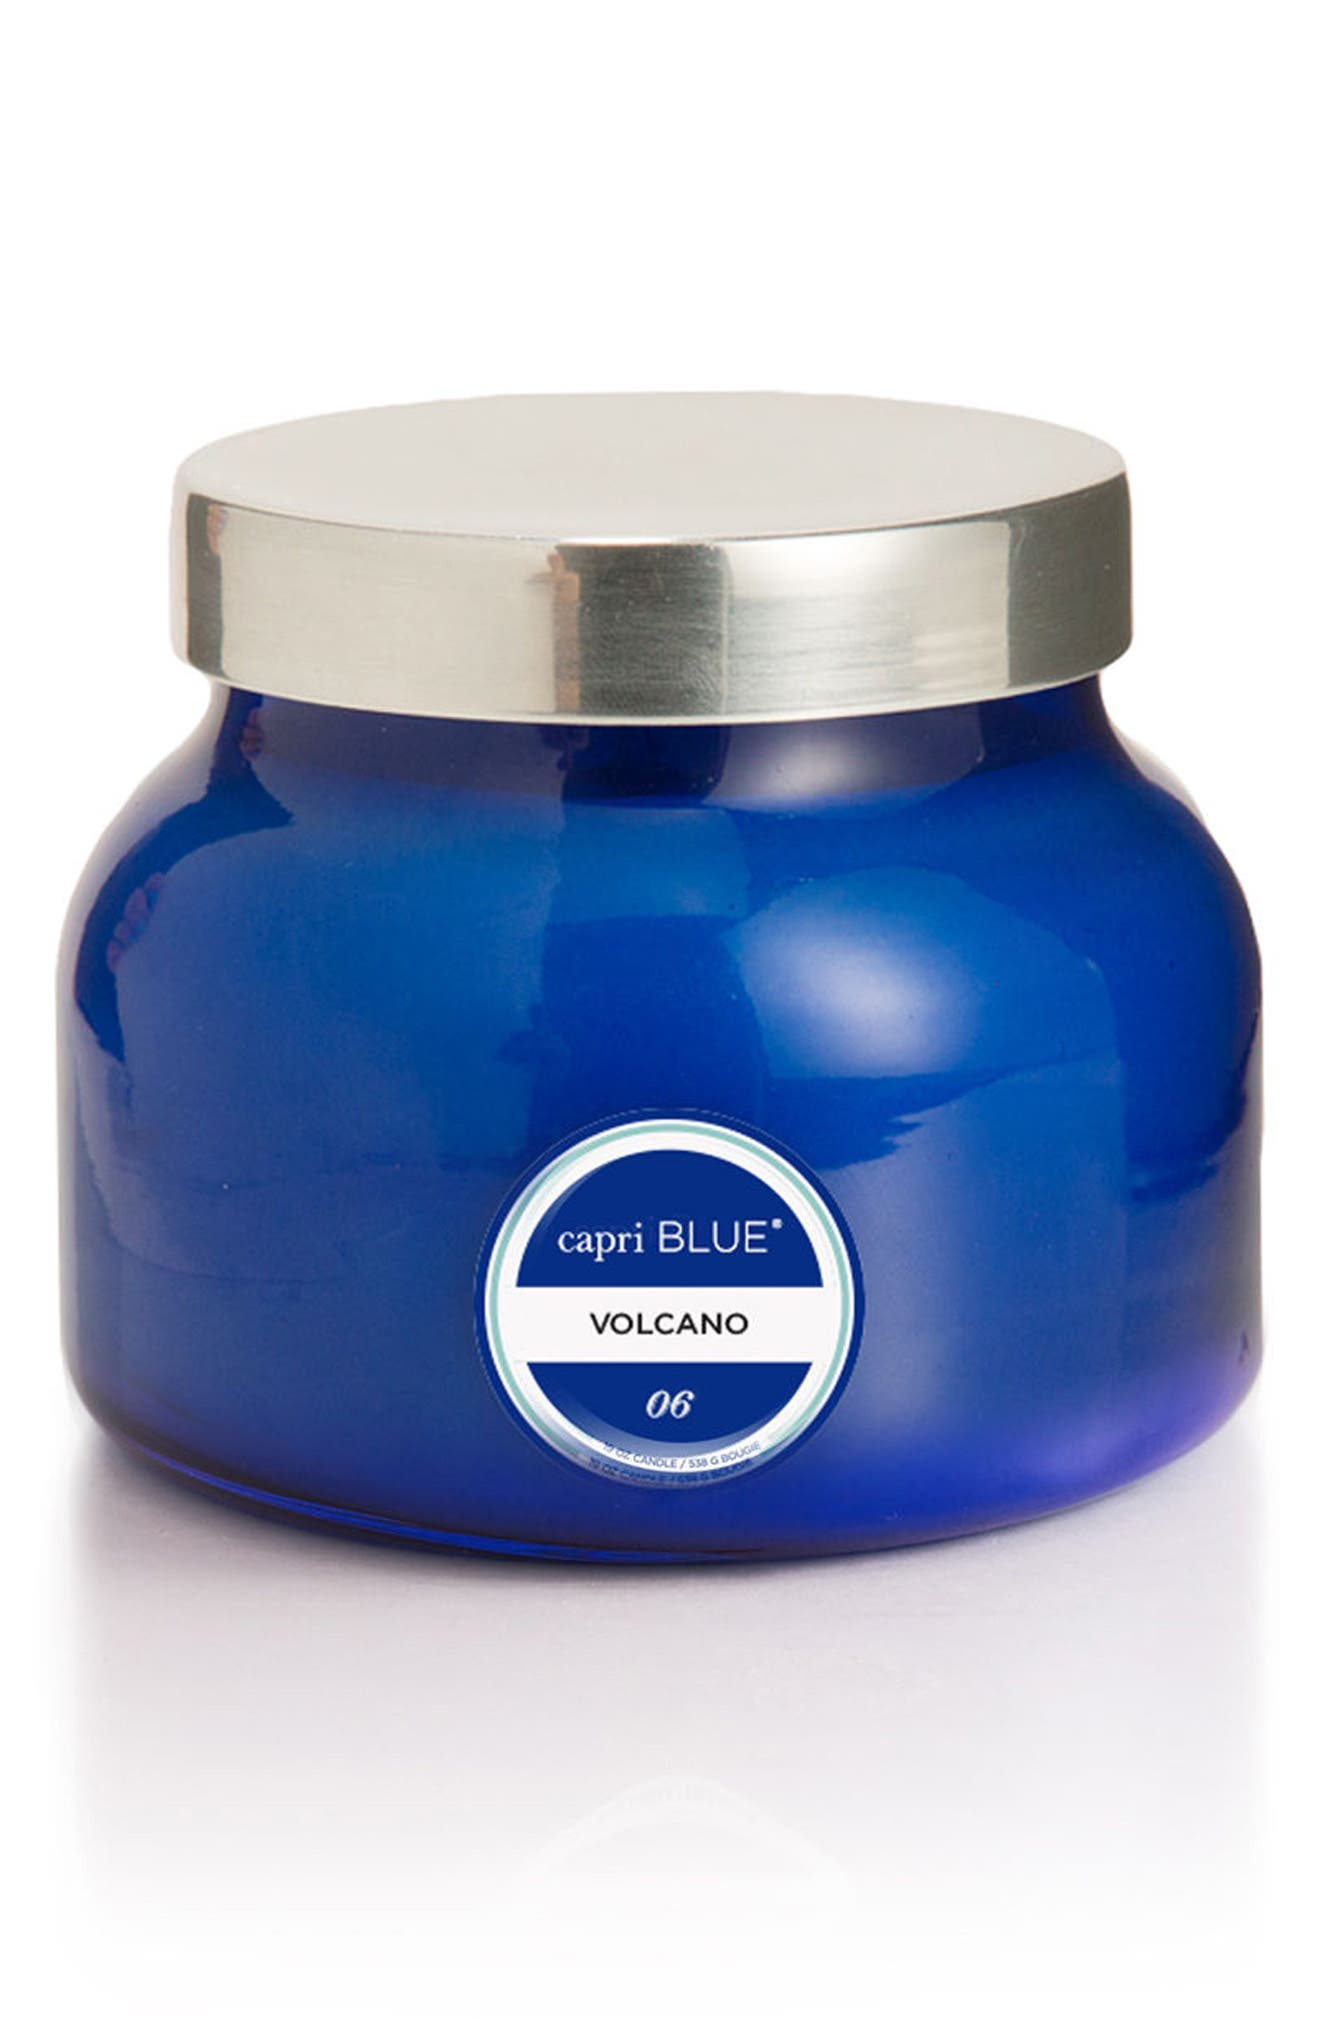 Capri Blue Petite Volcano Scented Jar Candle